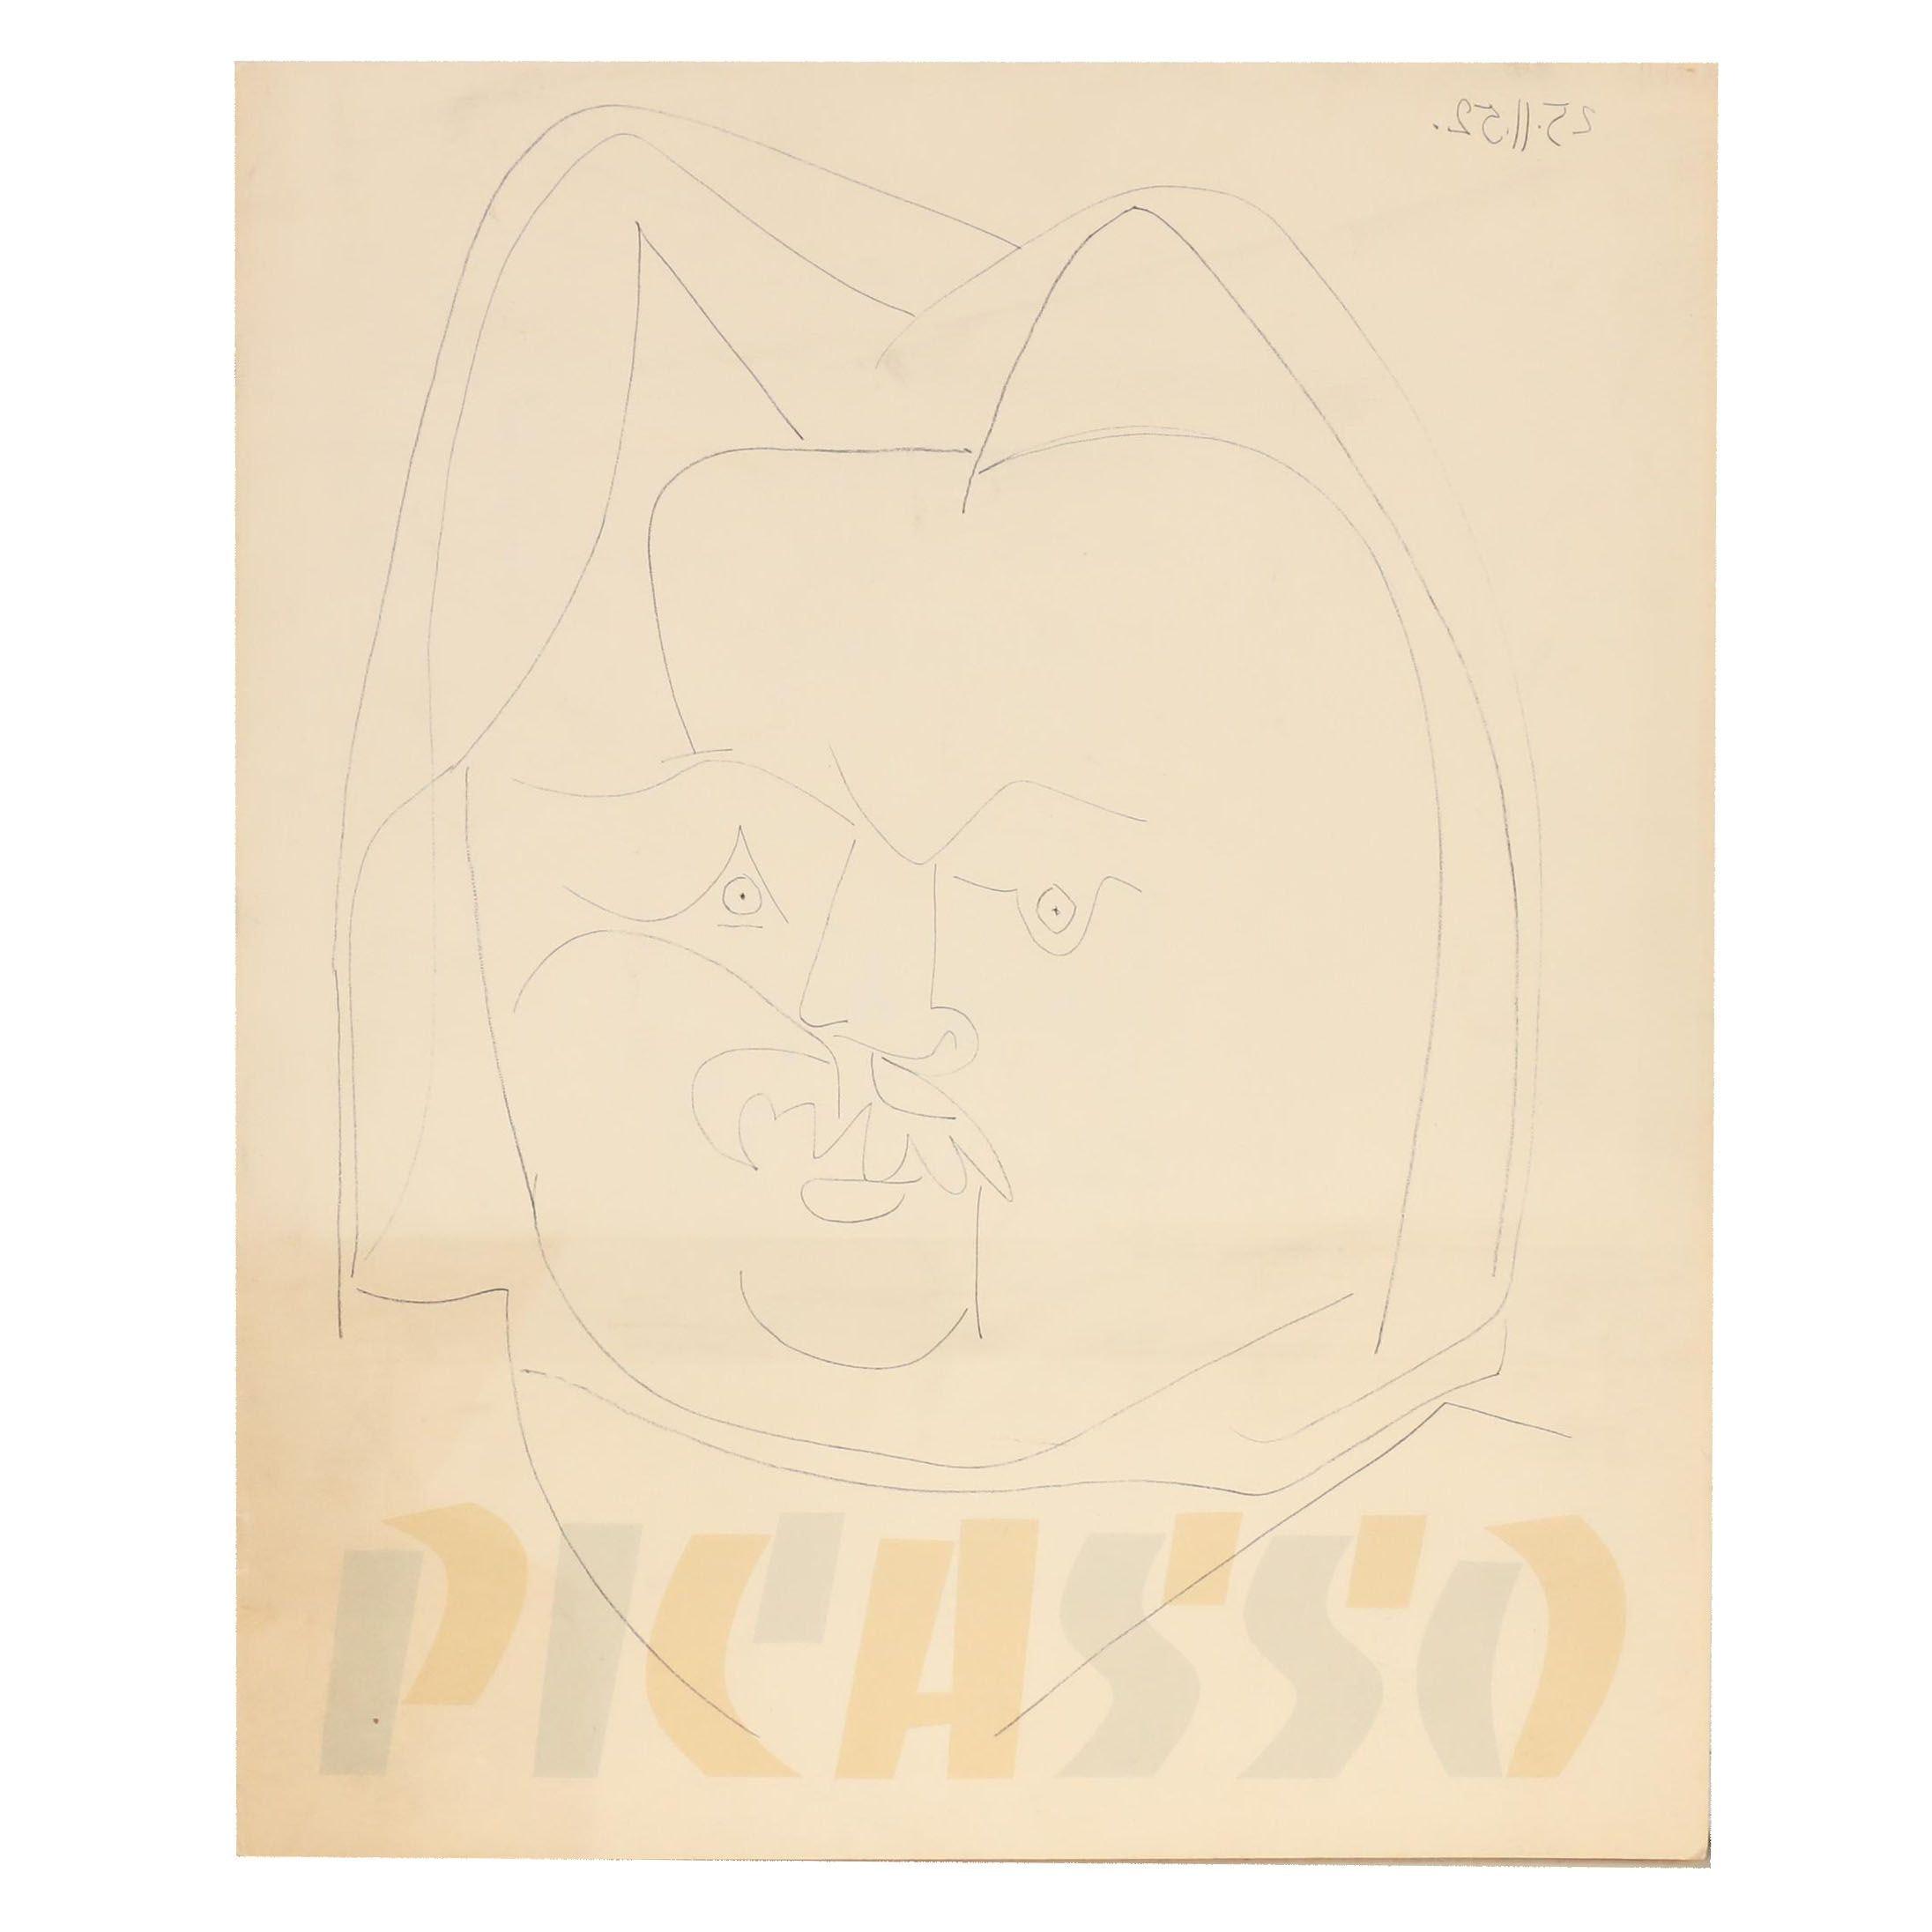 Cincinnati Art Museum Catalog for 1959 Pablo Picasso Lithograph Exhibition